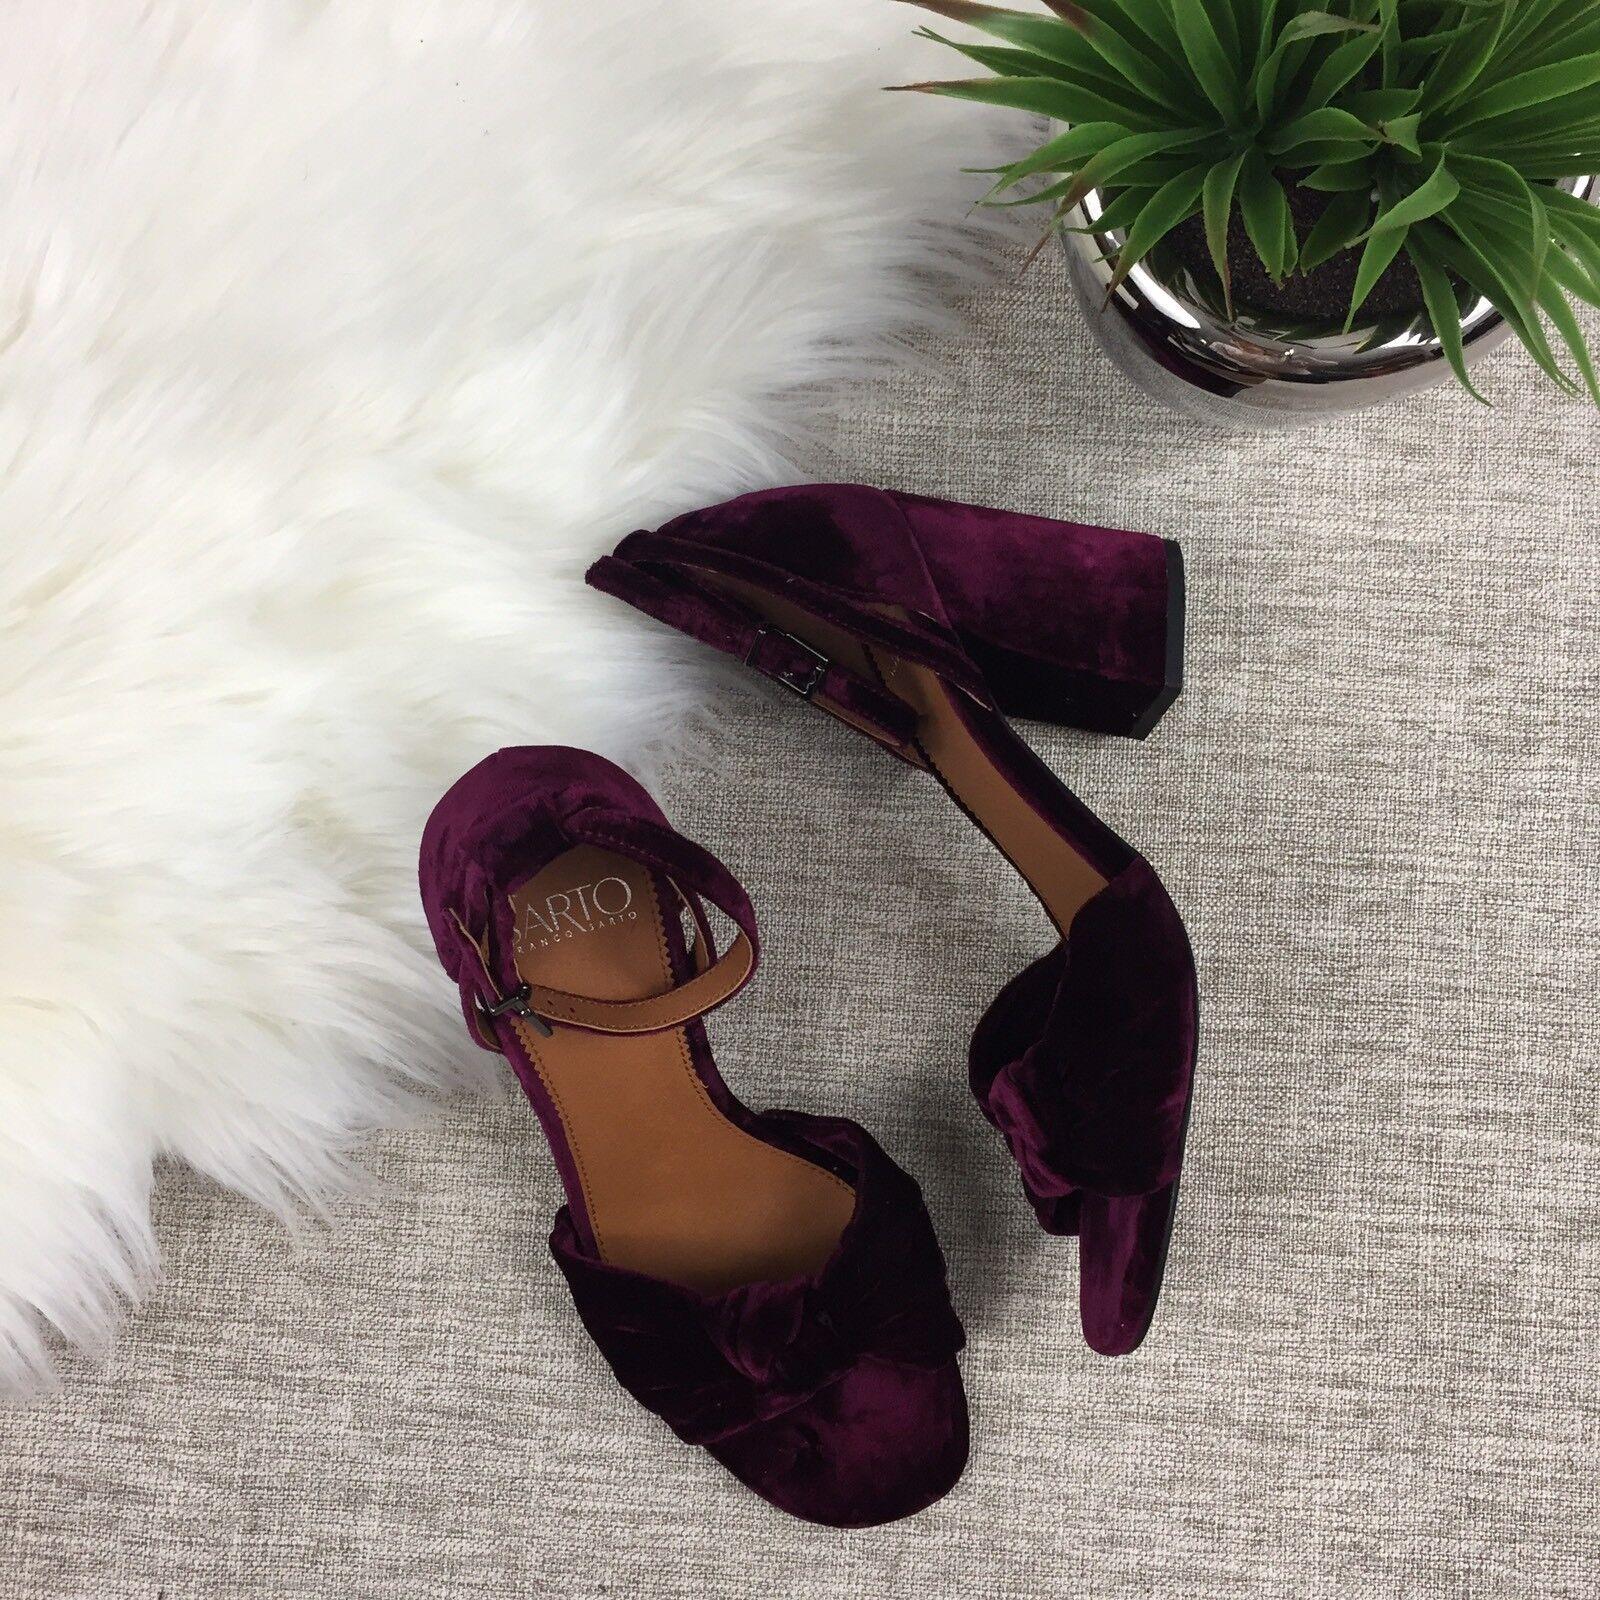 NWT Franco Sarto Edana Heeled Sandale, Ankle Strap, Velvet, Bow, Sz 8, Burgundy